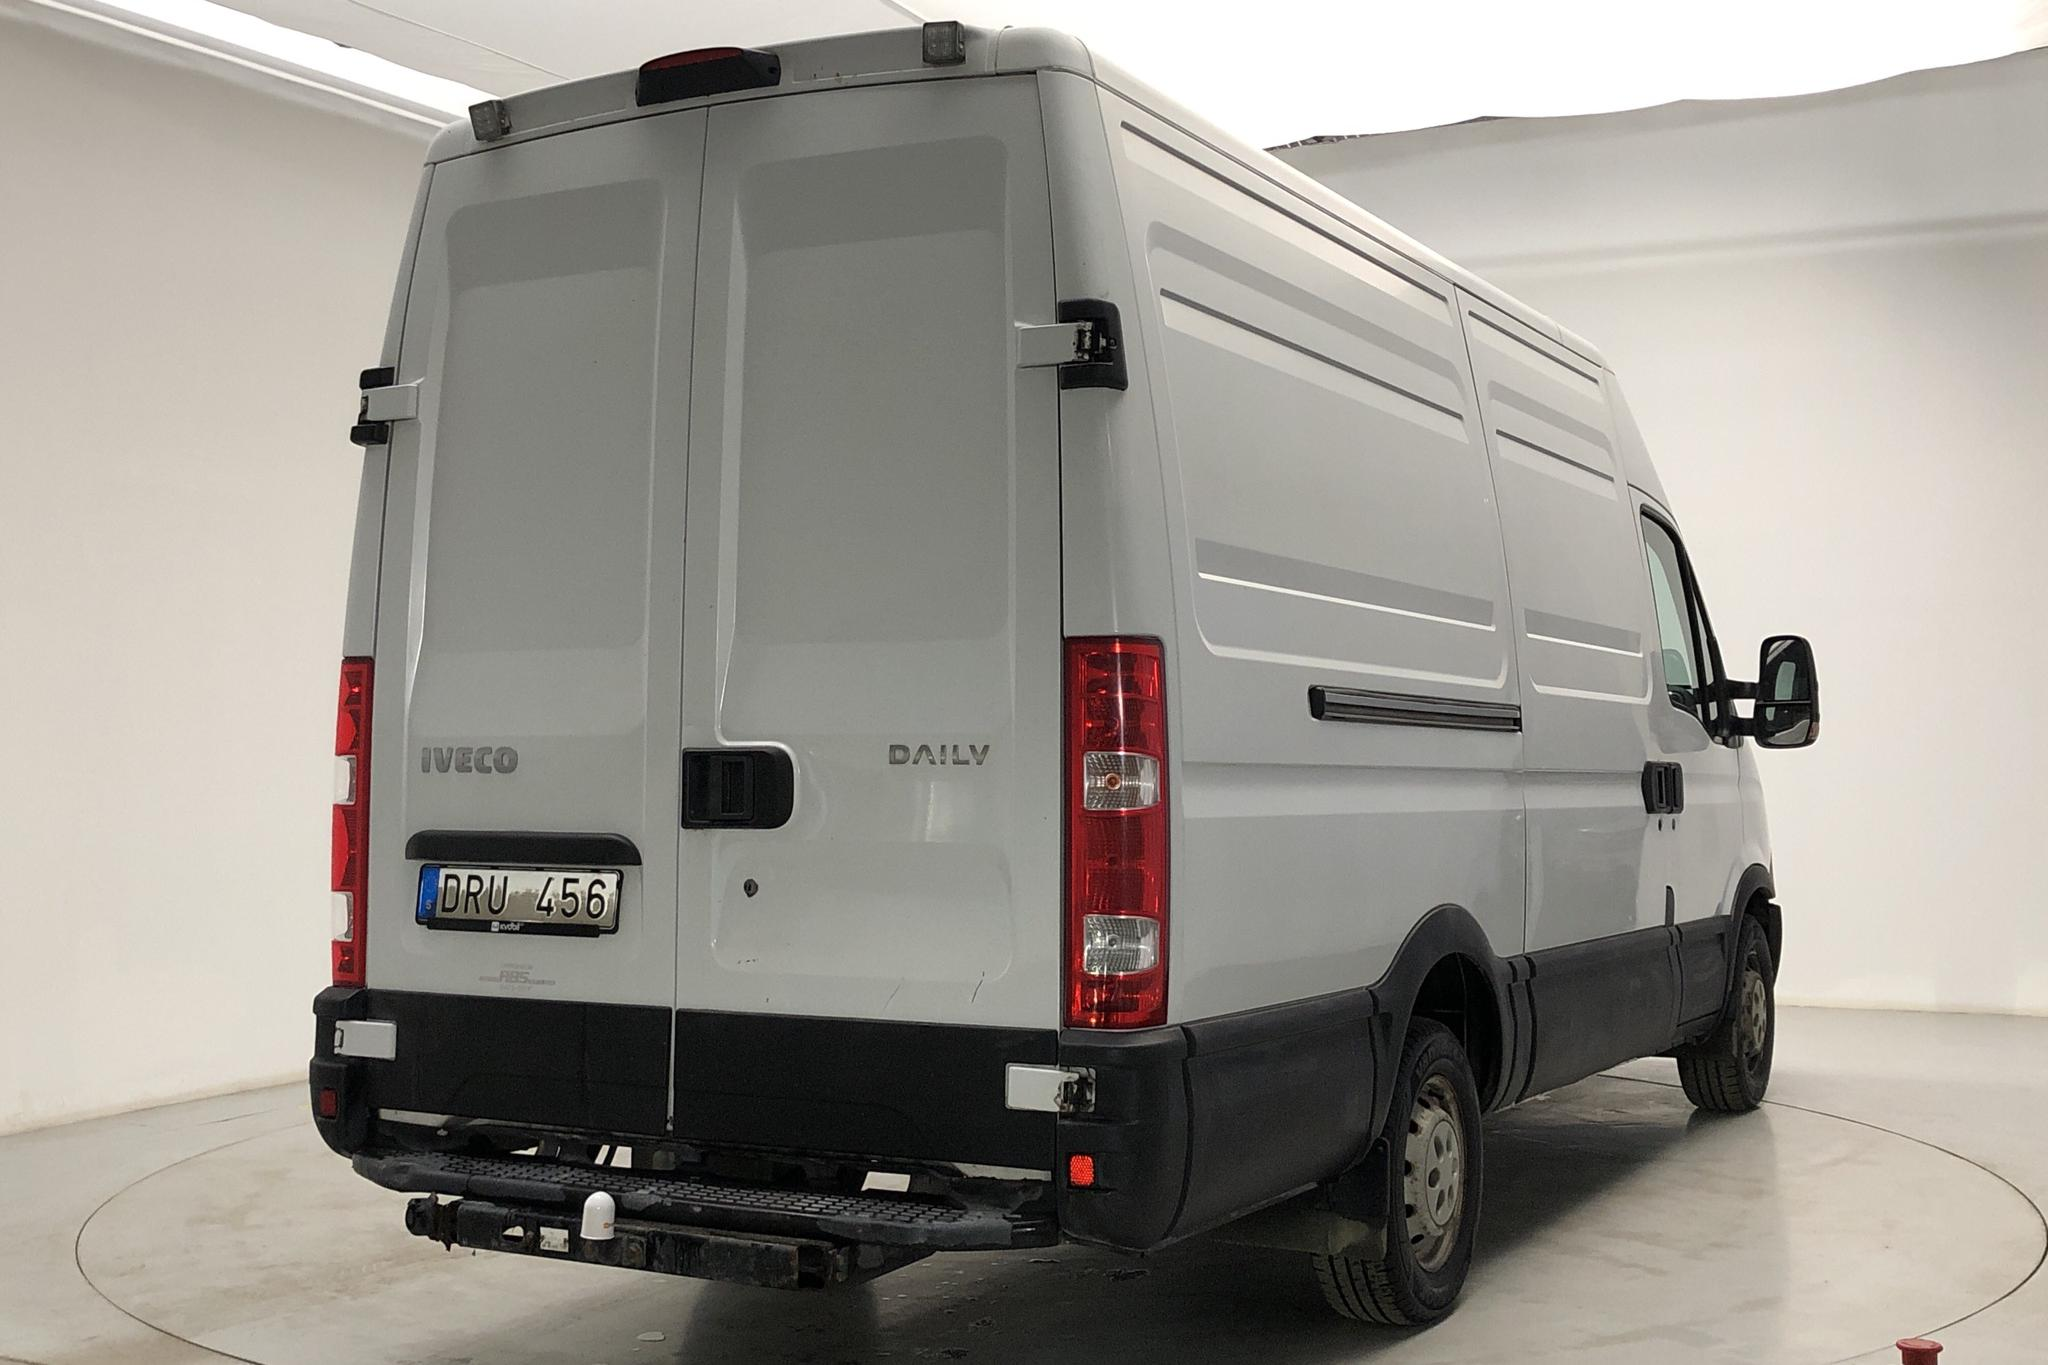 Iveco Daily 35 2.3 HPT (126hk) - 201 010 km - Manual - white - 2013